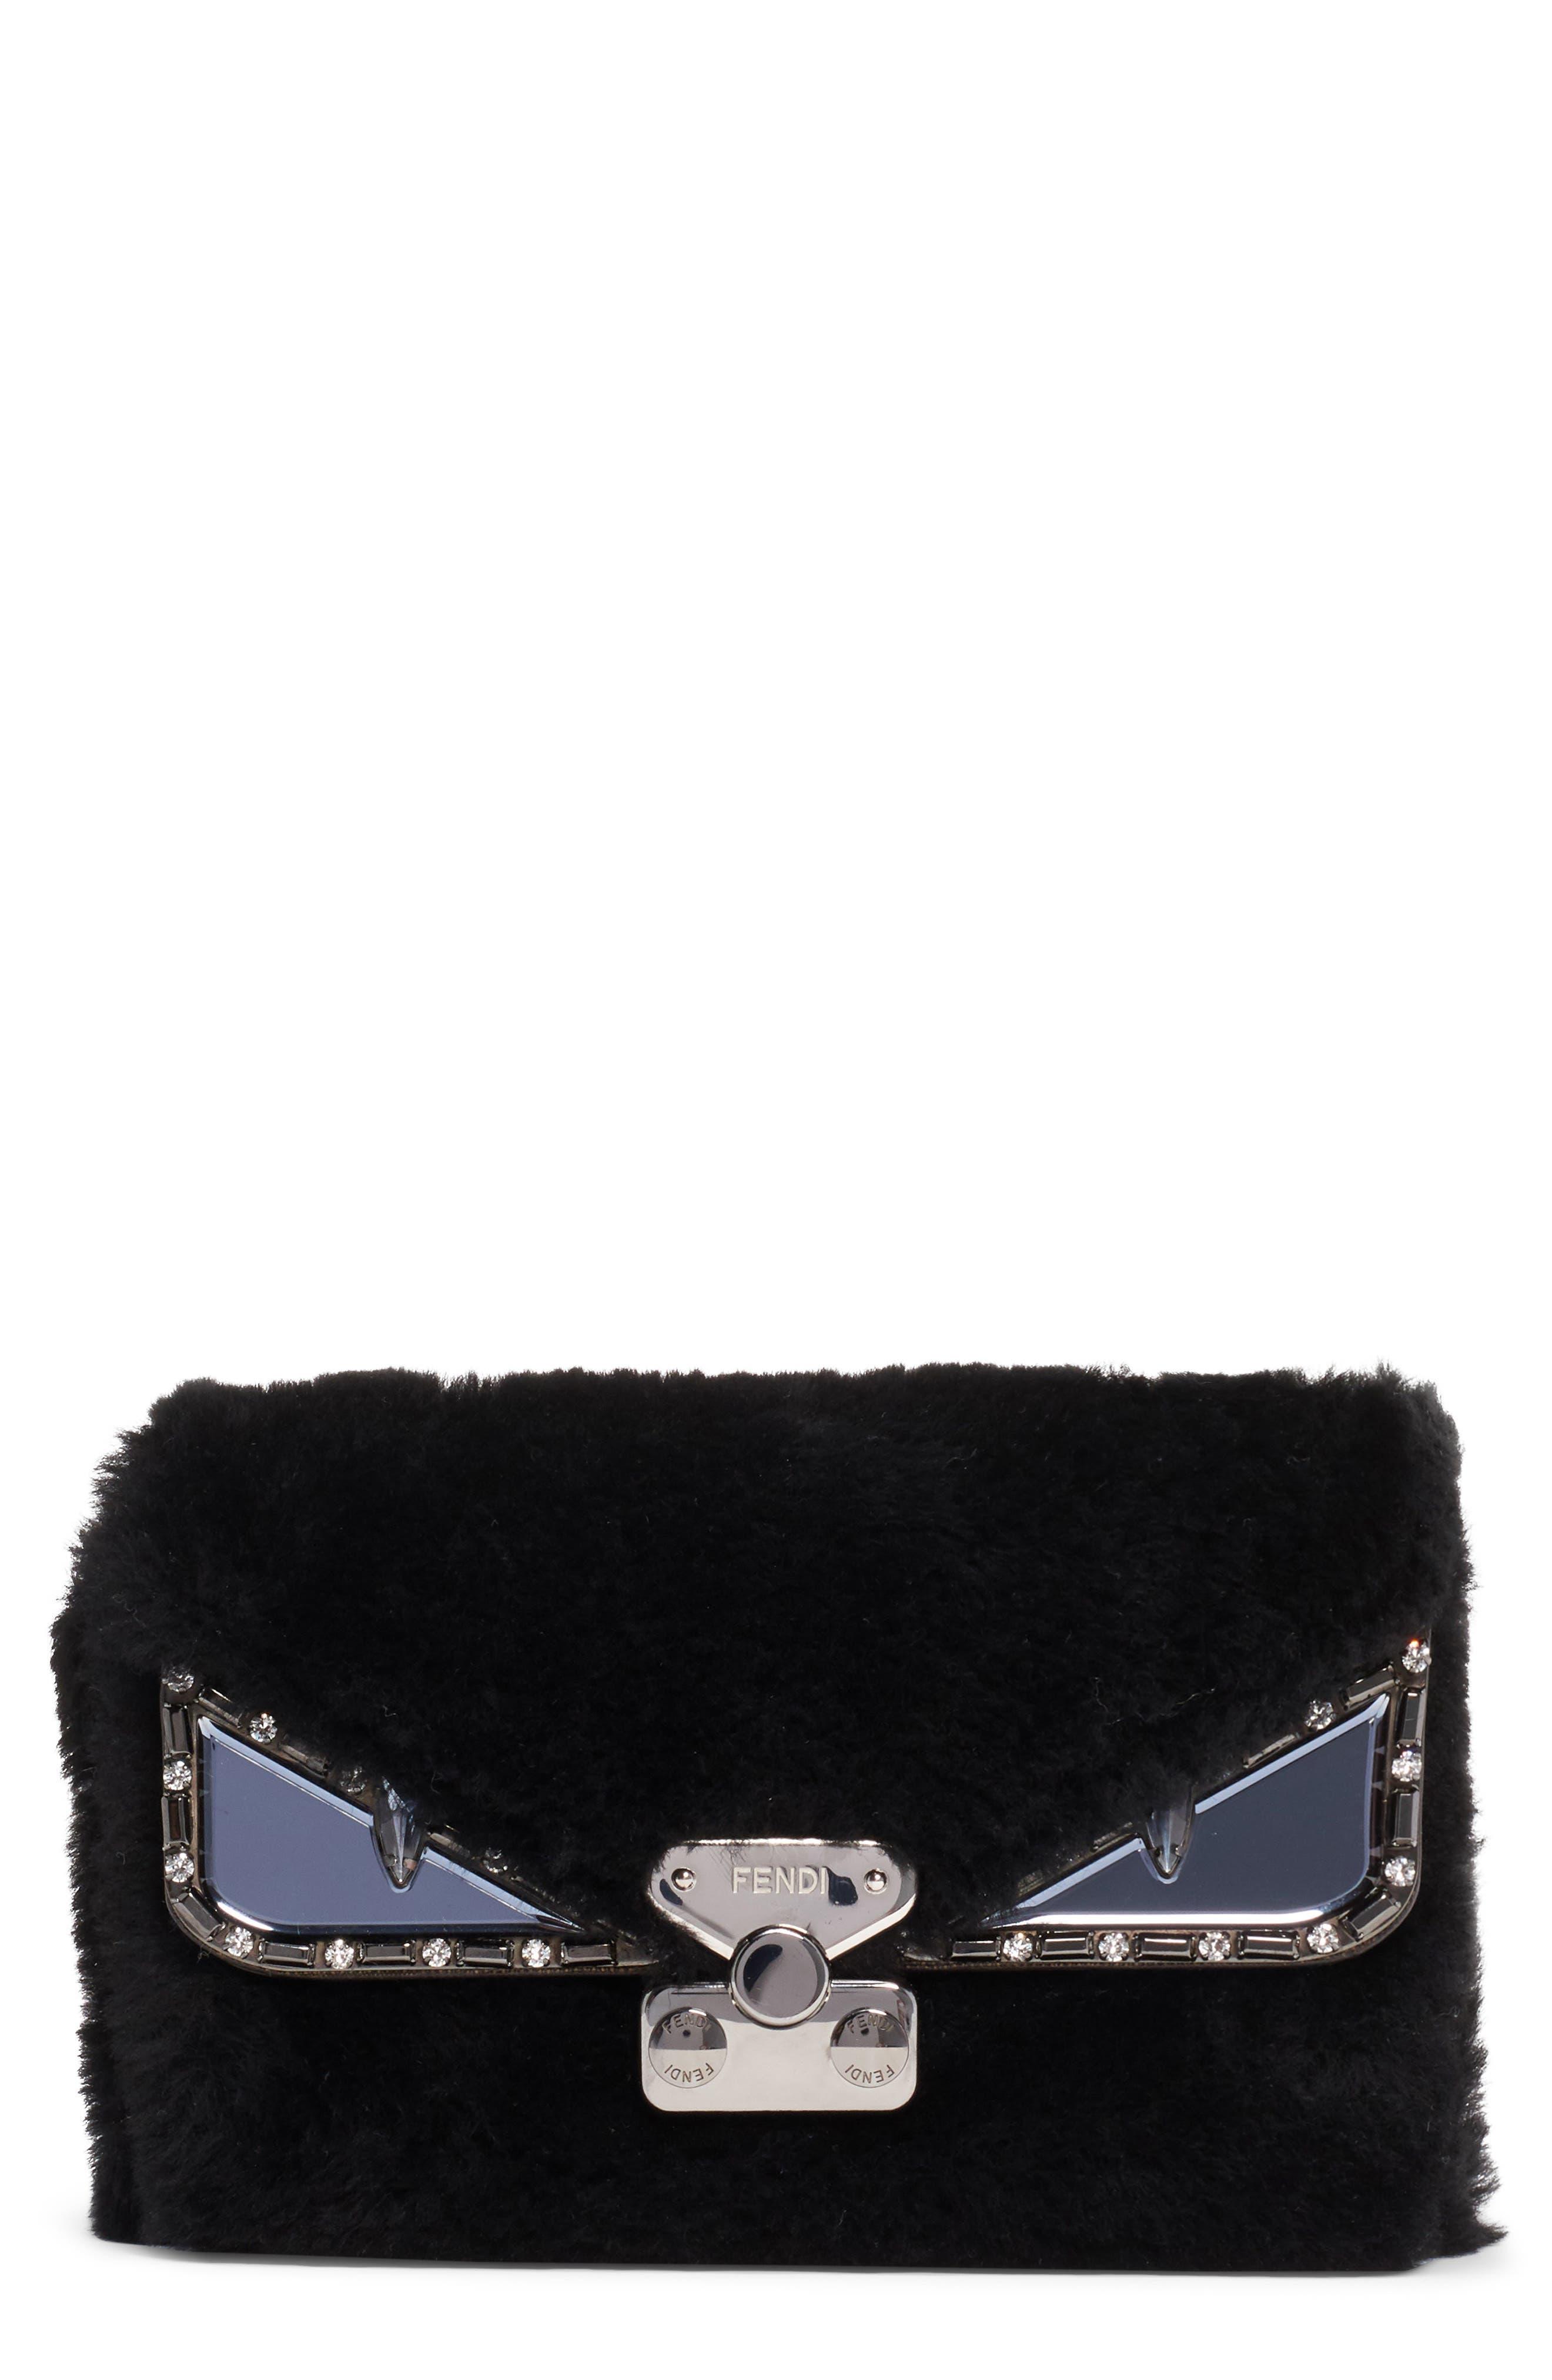 fc19553e Fendi Crossbody Bags | Nordstrom